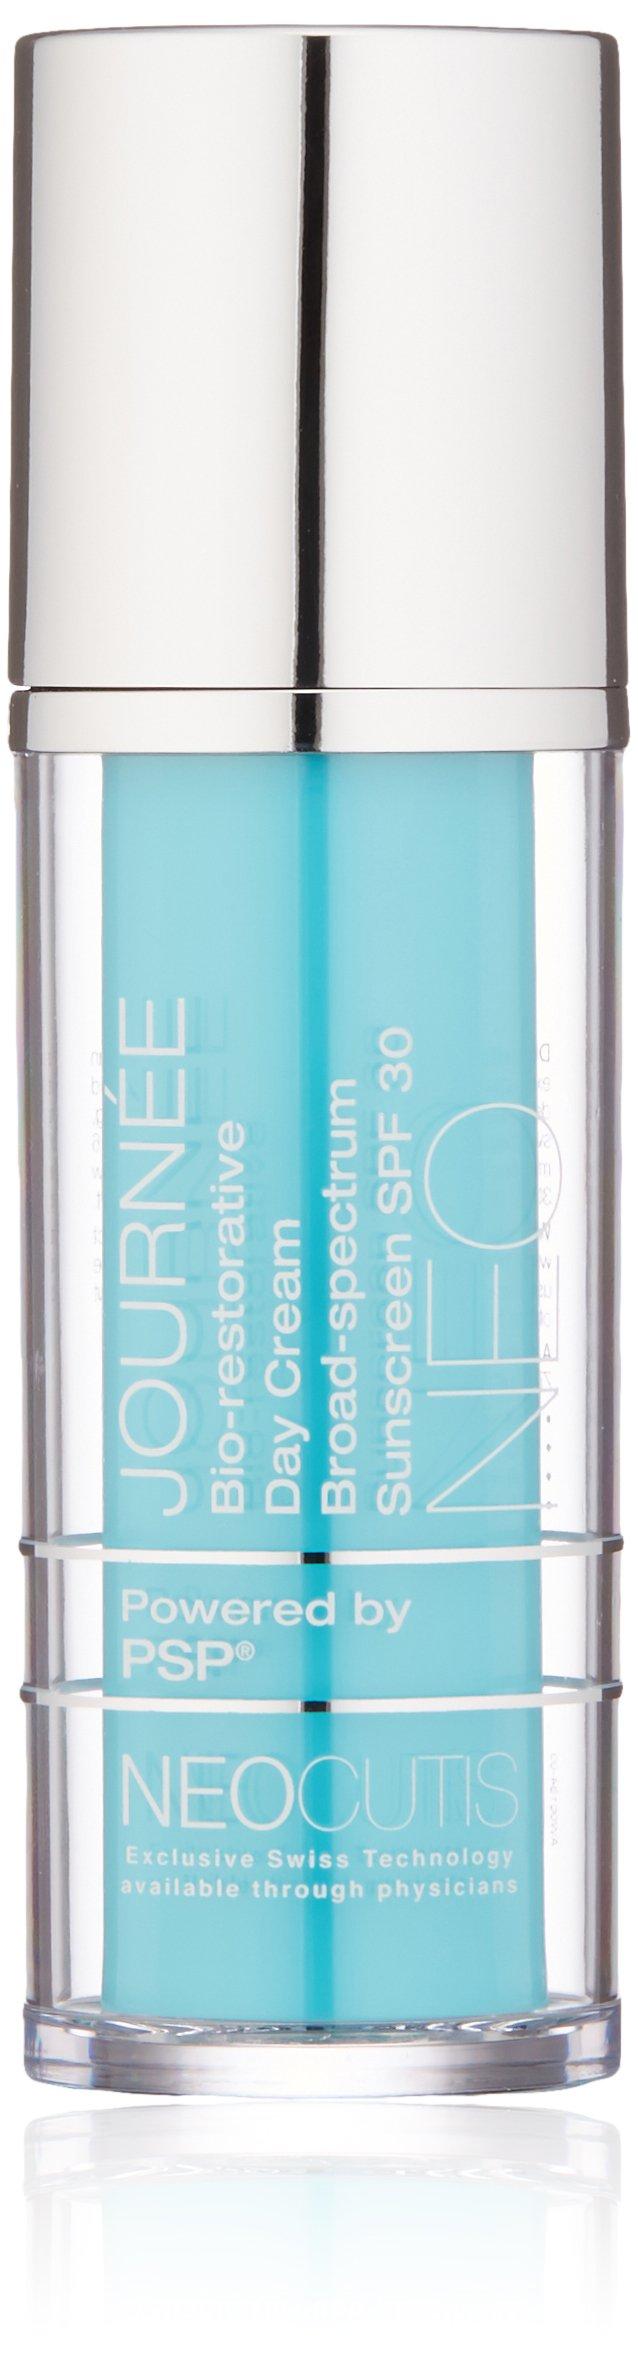 NEOCUTIS Journée Bio-restorative Day Cream Broad-spectrum SPF 30 Sunscreen, 1 Fl Oz by NeoCutis